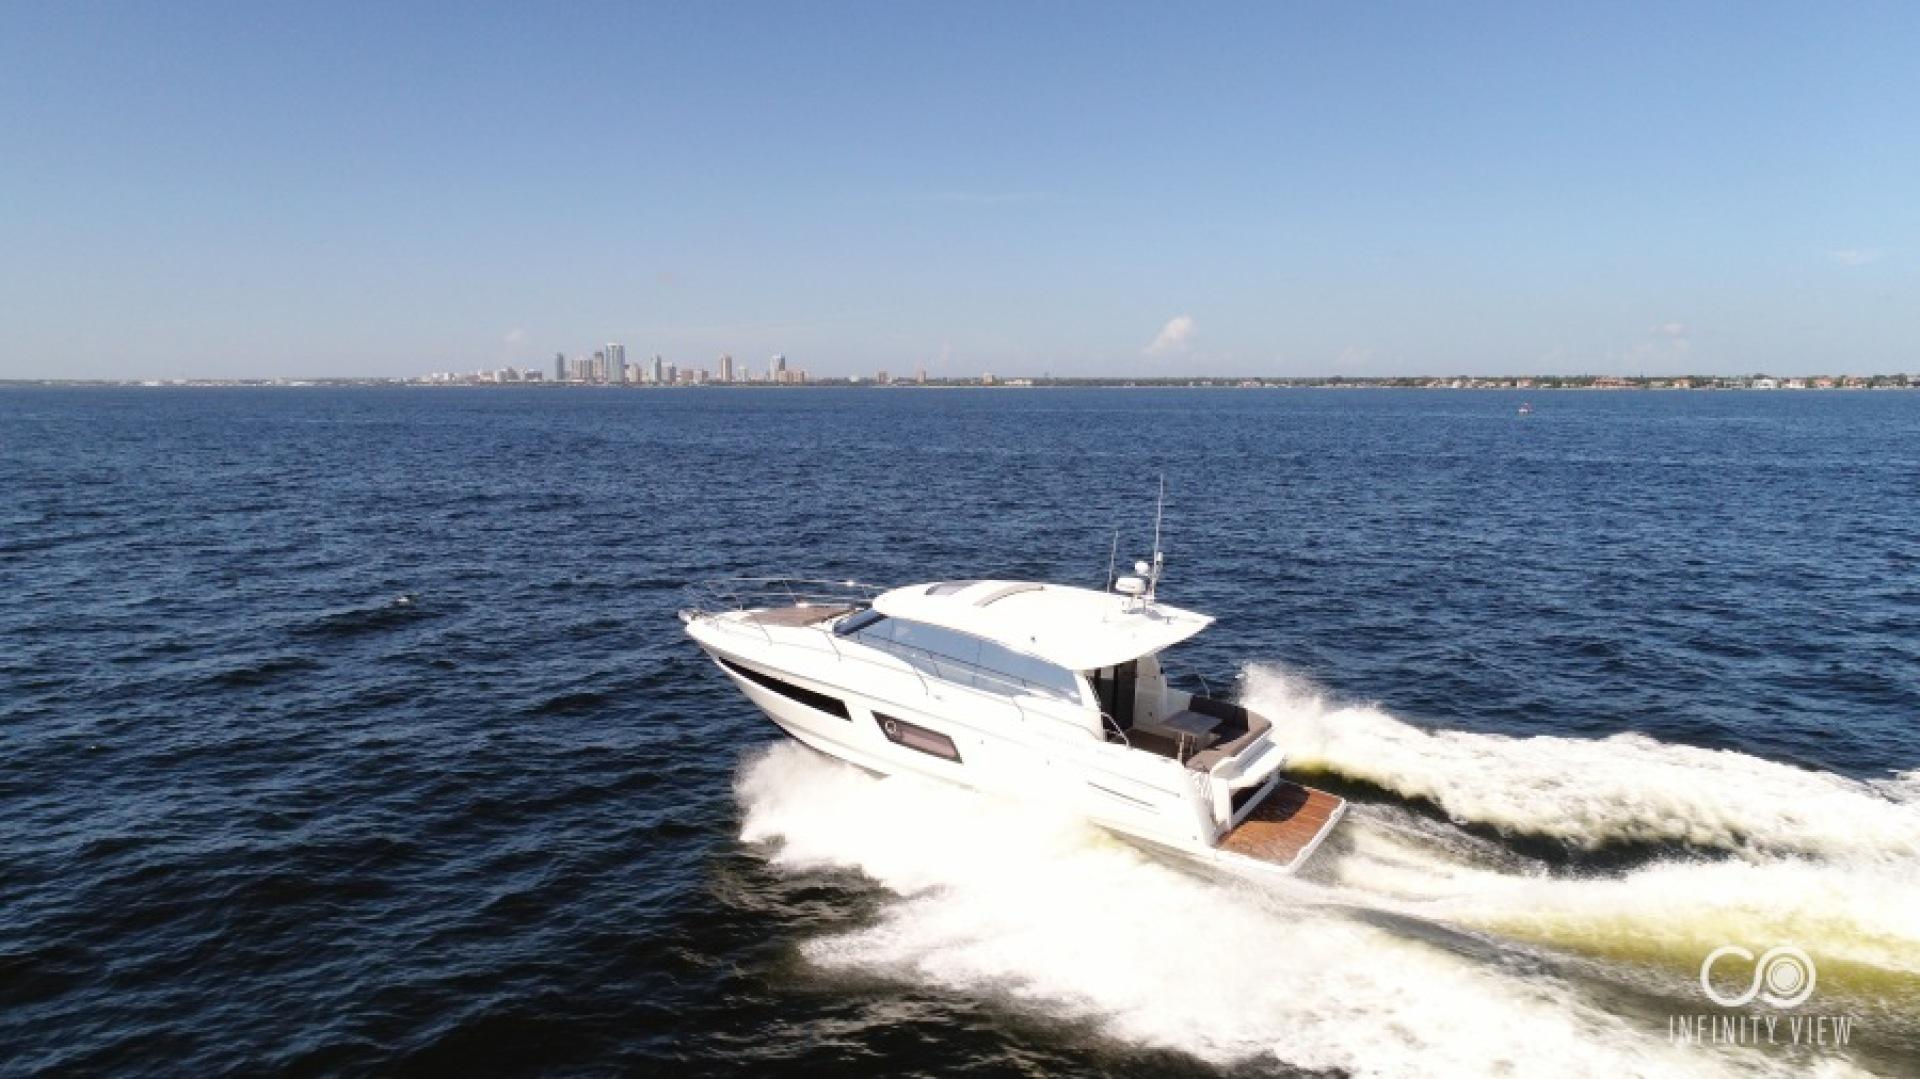 Prestige-460 S 2018-Unforgettable St Petersburg-Florida-United States-2018 Prestige 460 S Yacht  Unforgettable  Running Profile-1444305   Thumbnail